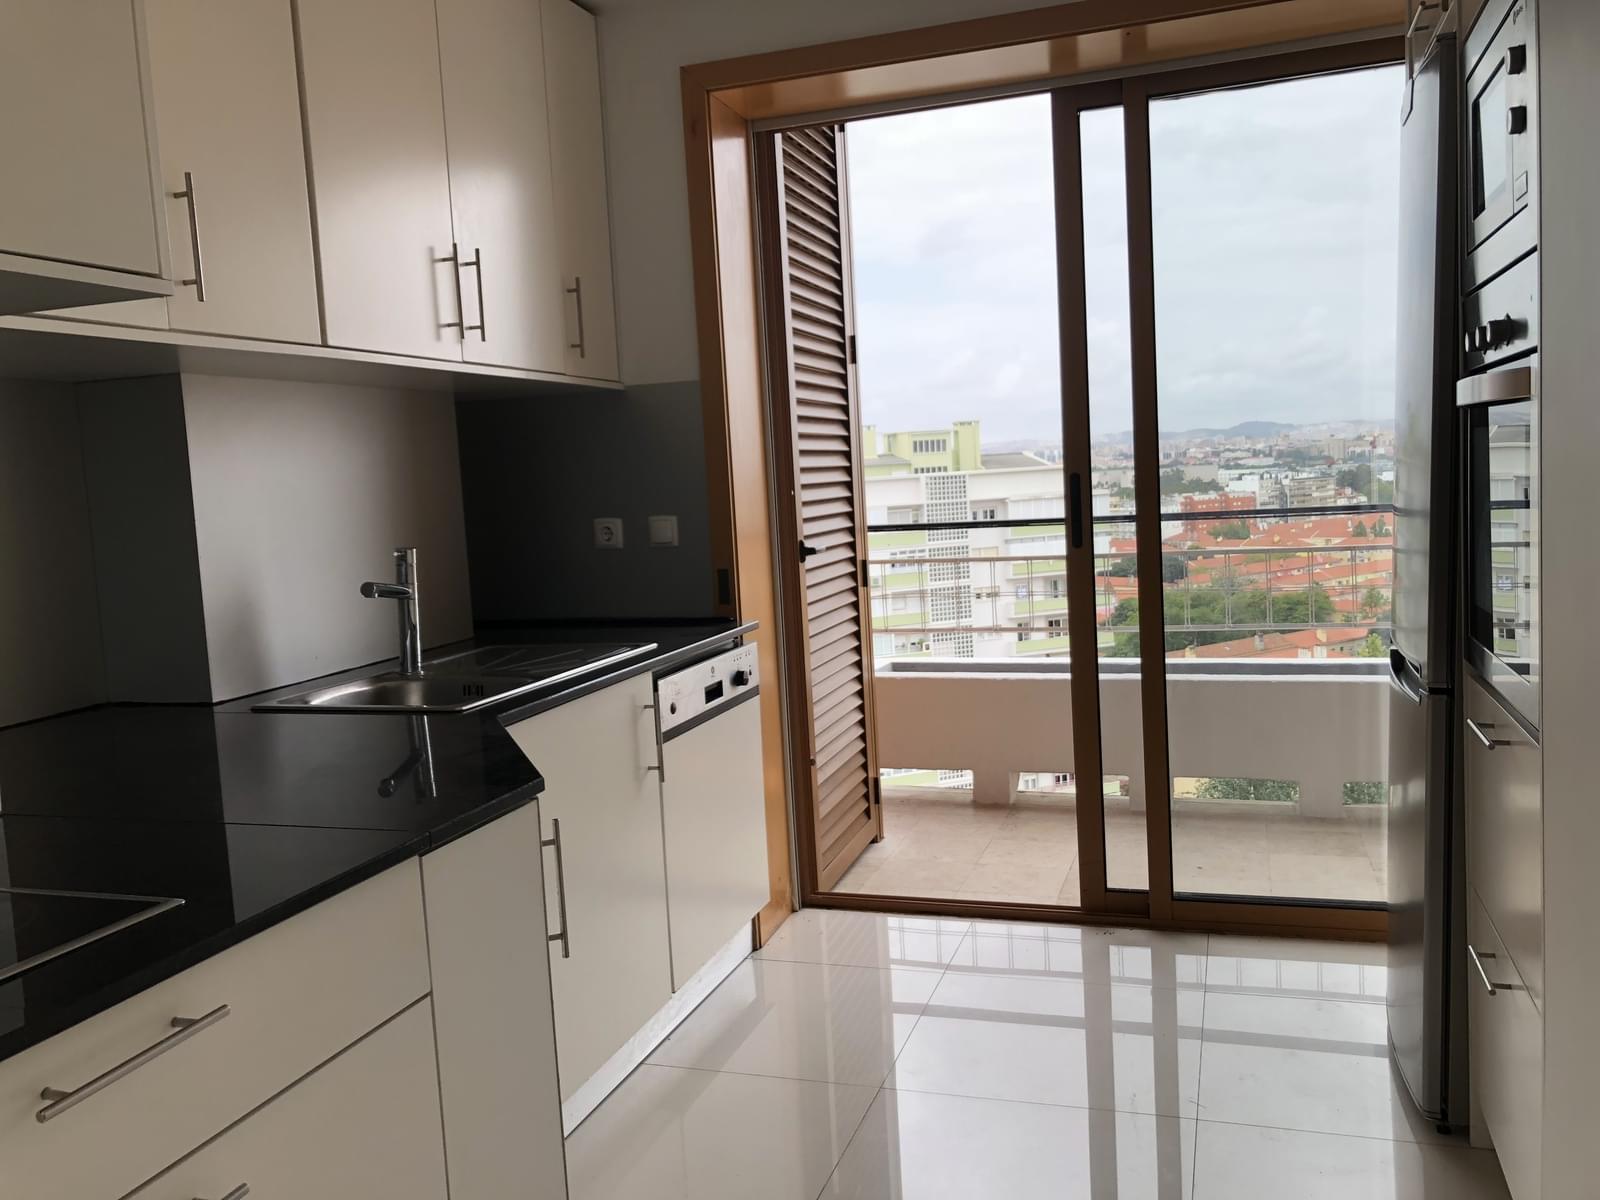 pf18040-apartamento-t3-lisboa-c726283c-b70e-4ce6-b402-b18f111be859